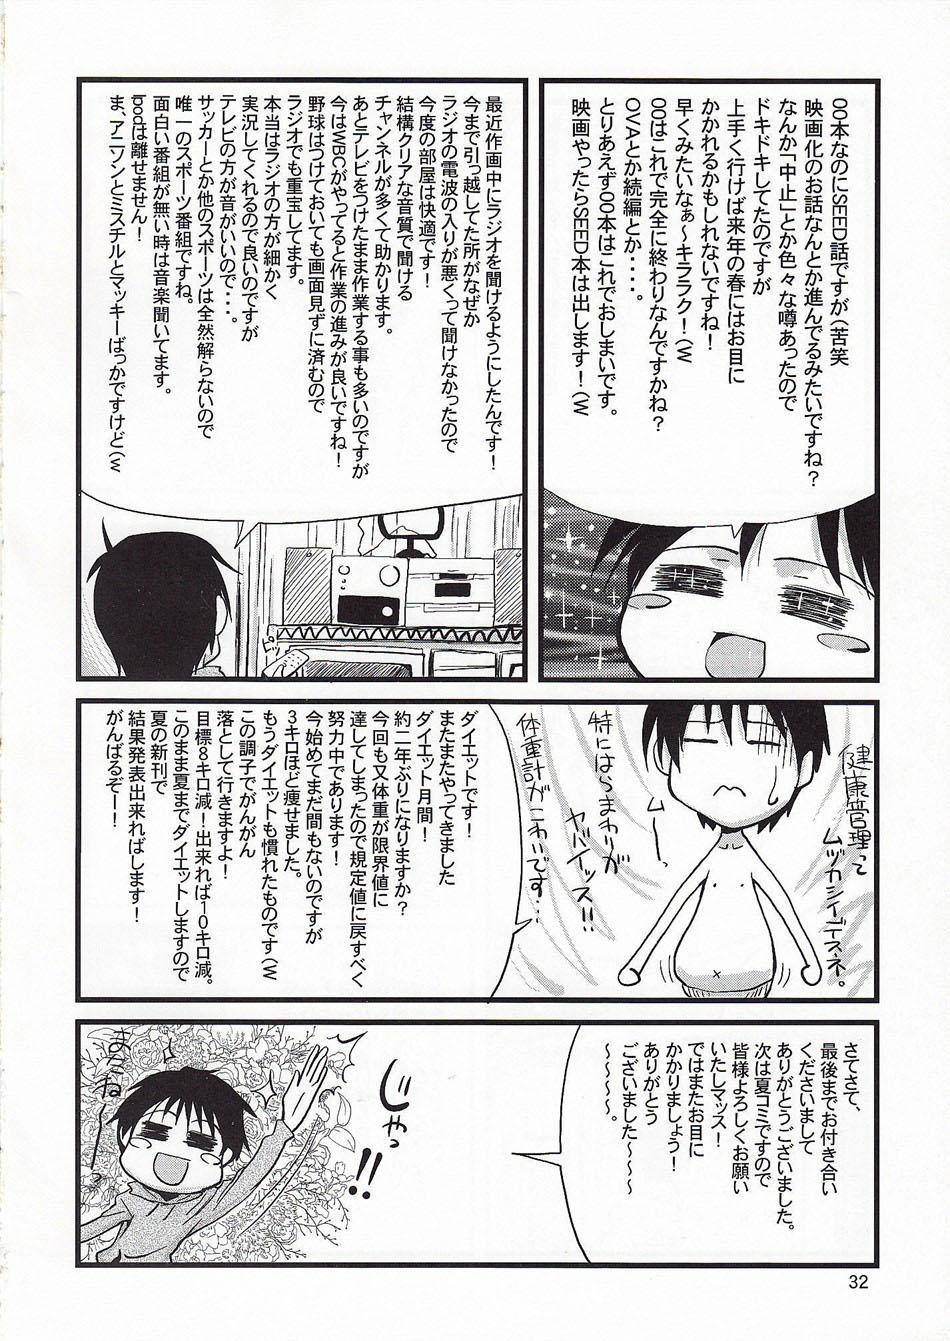 COMIC Daybreak vol.5 29